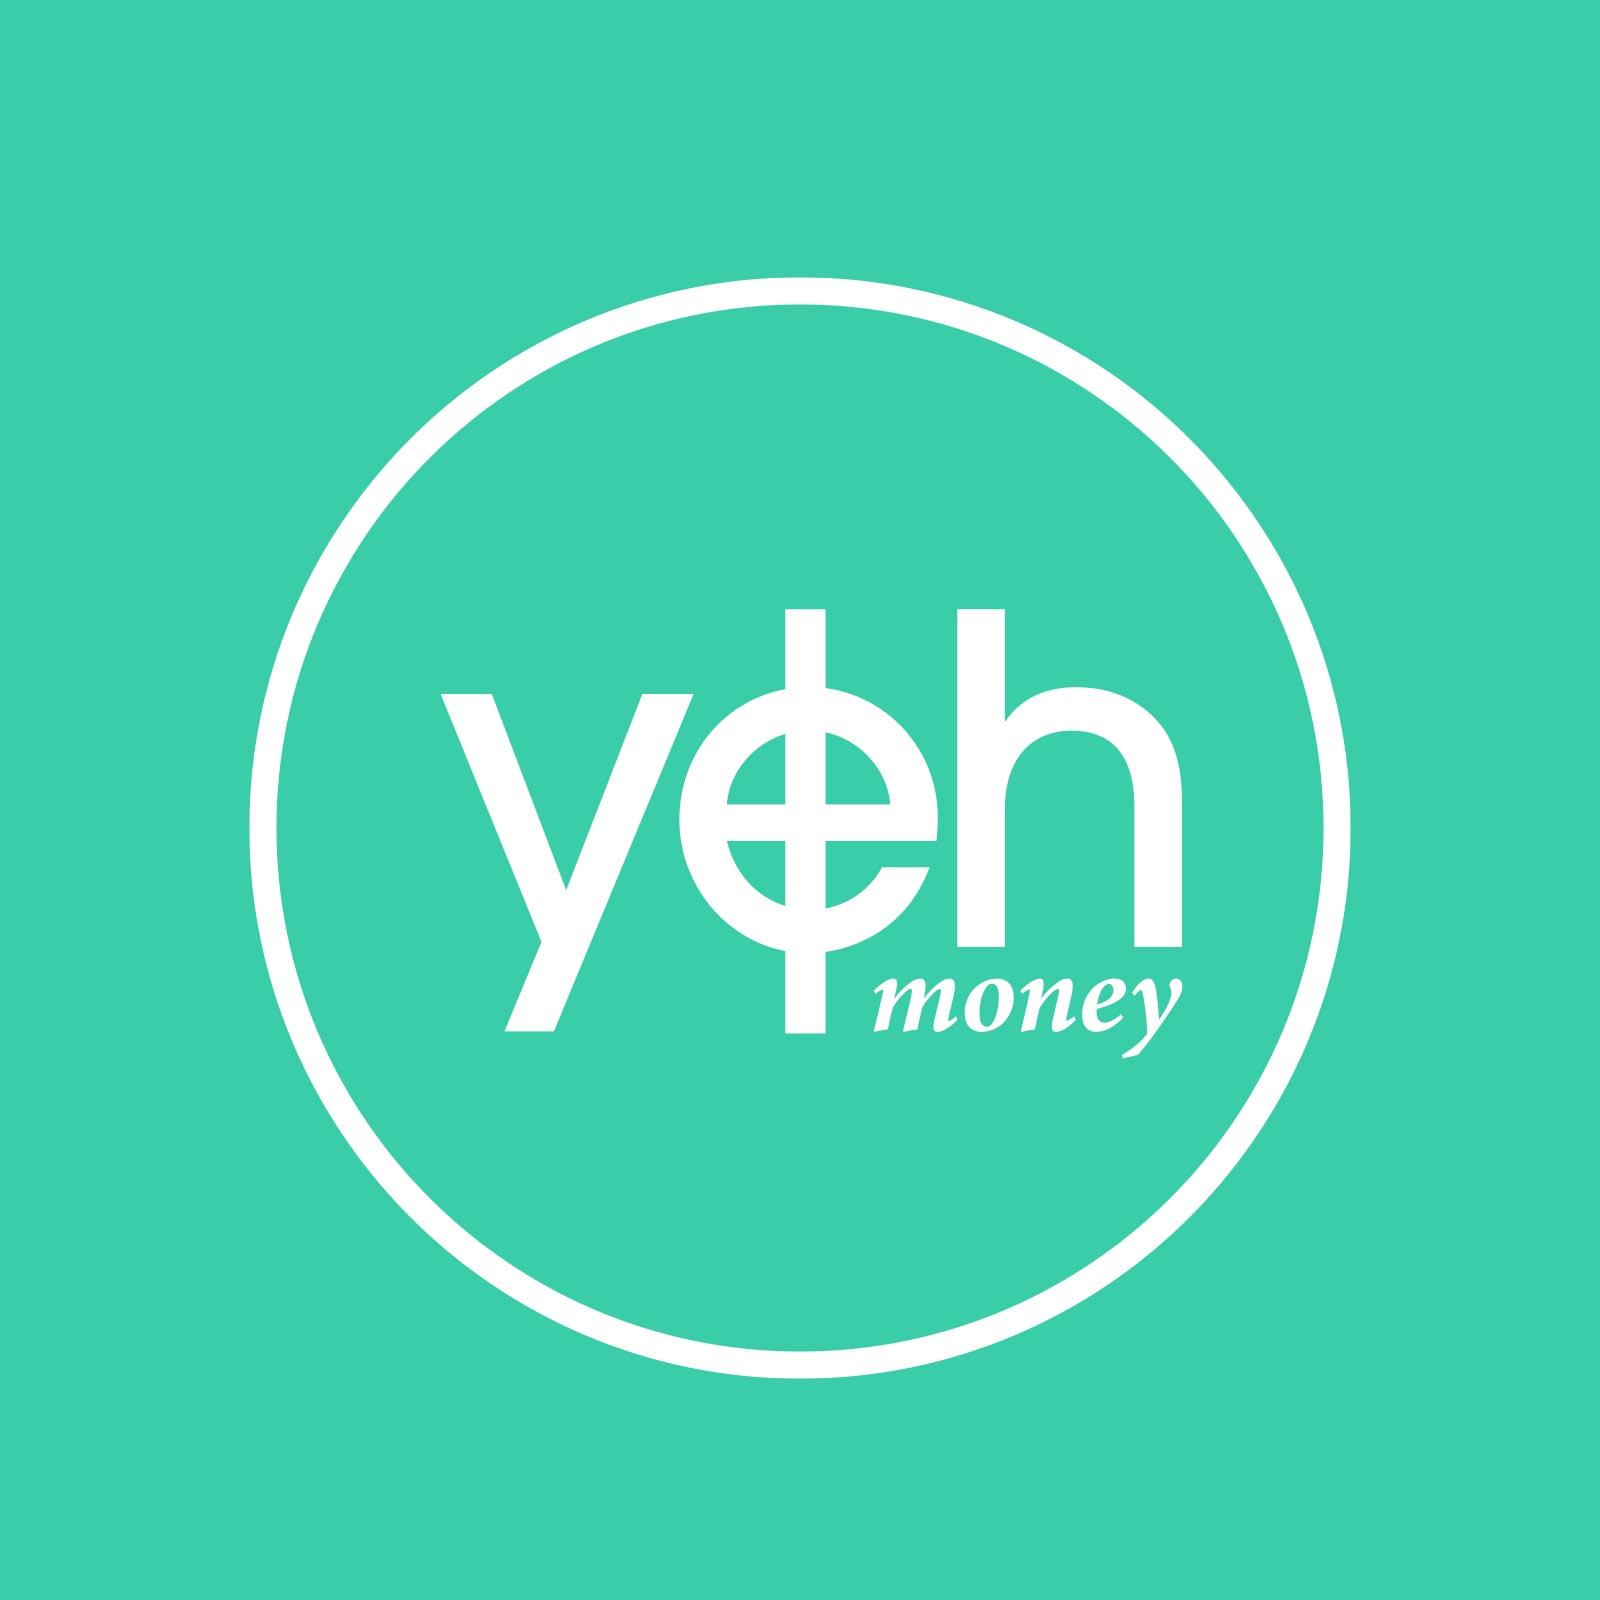 Yeah_money-logo.jpg